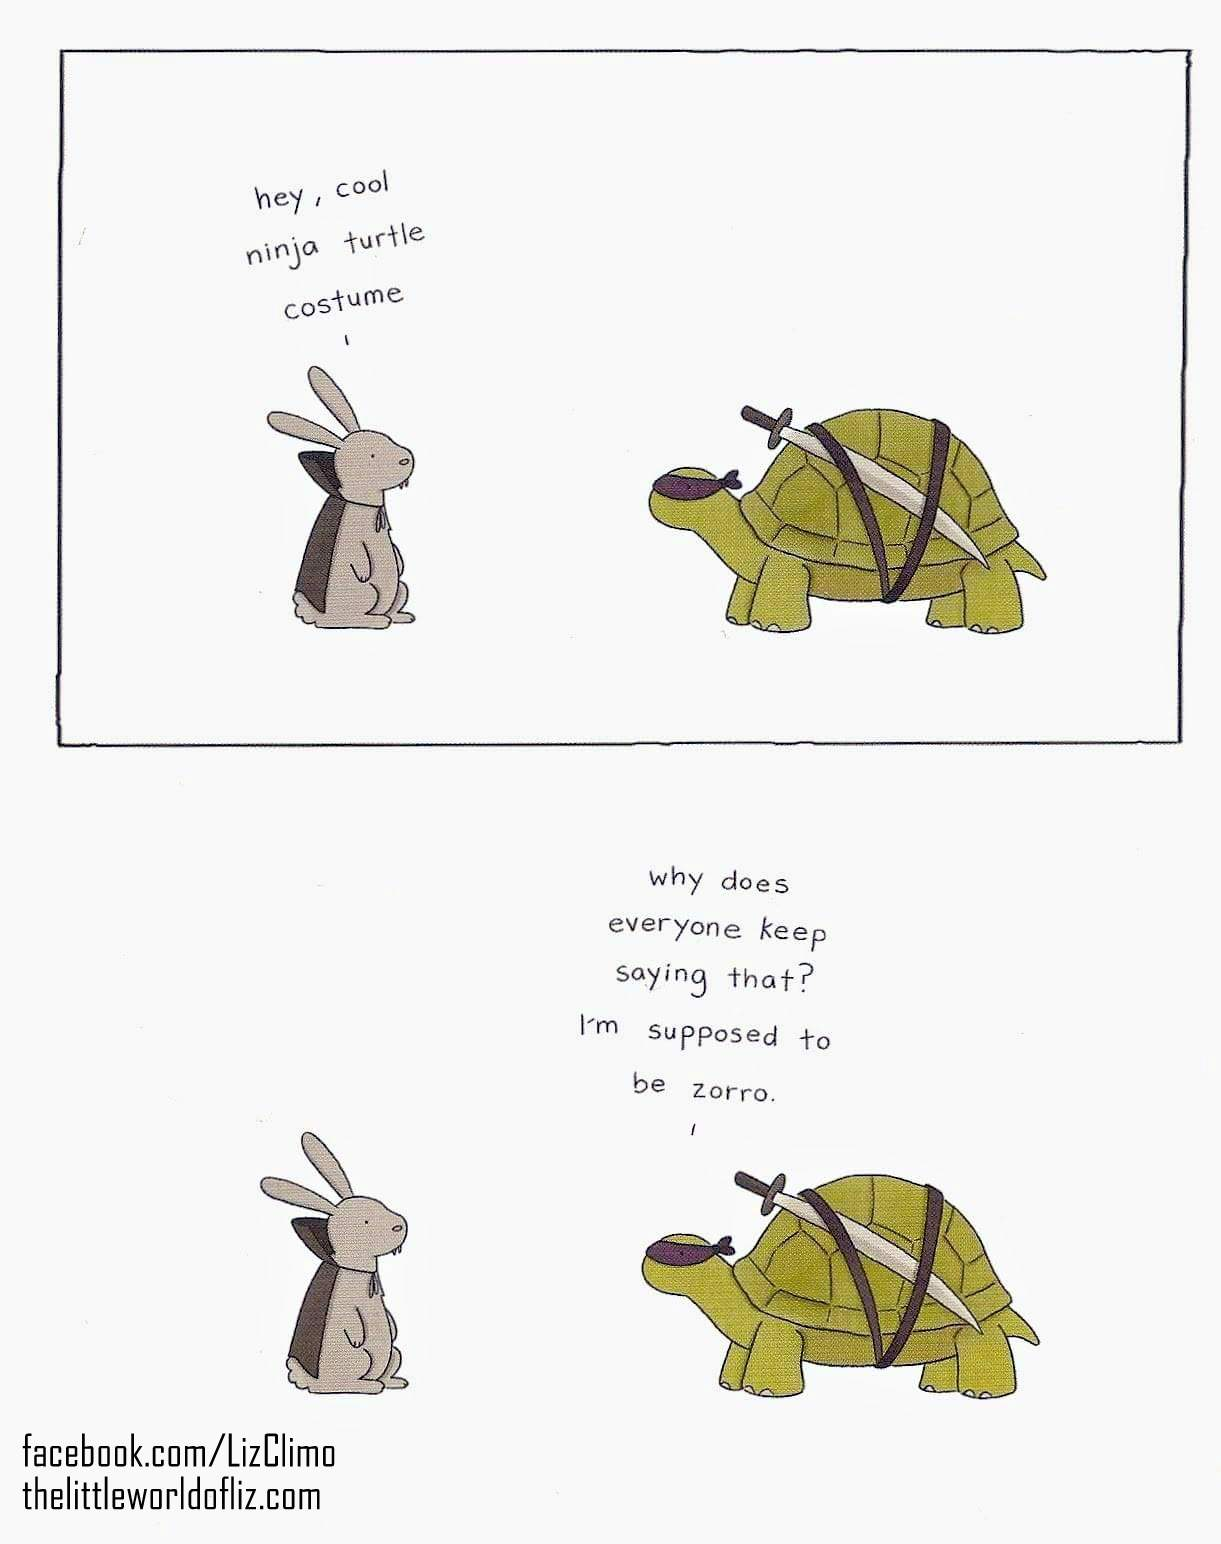 Liz%2BClimo%2BHalloween%2Bcostume rabbit ramblings funny bunny monday meme*day